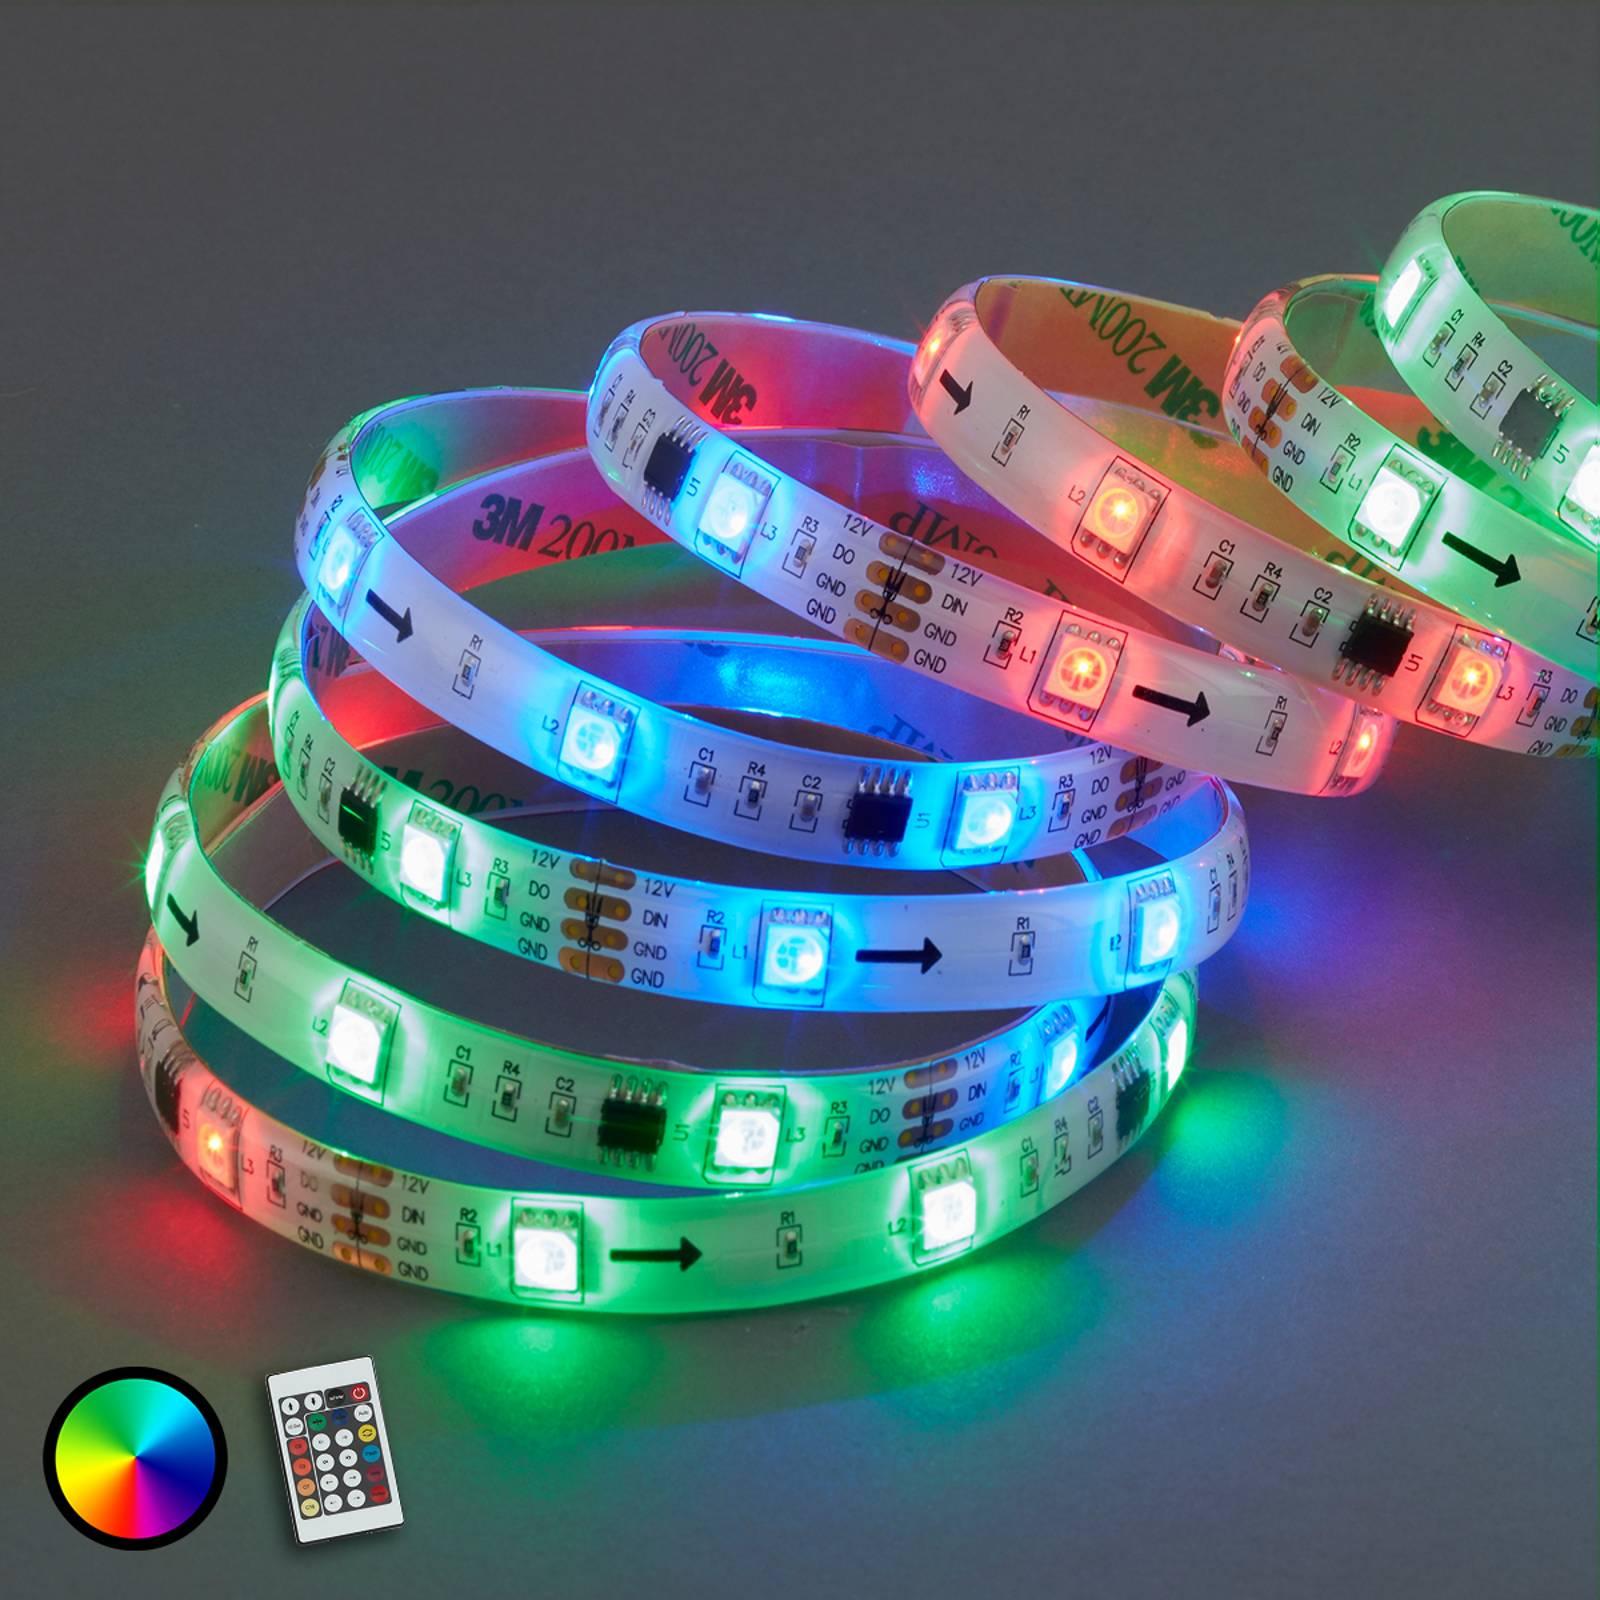 Mo-RGB-LED-valonauha 164 valotoiminnolla, 500 cm